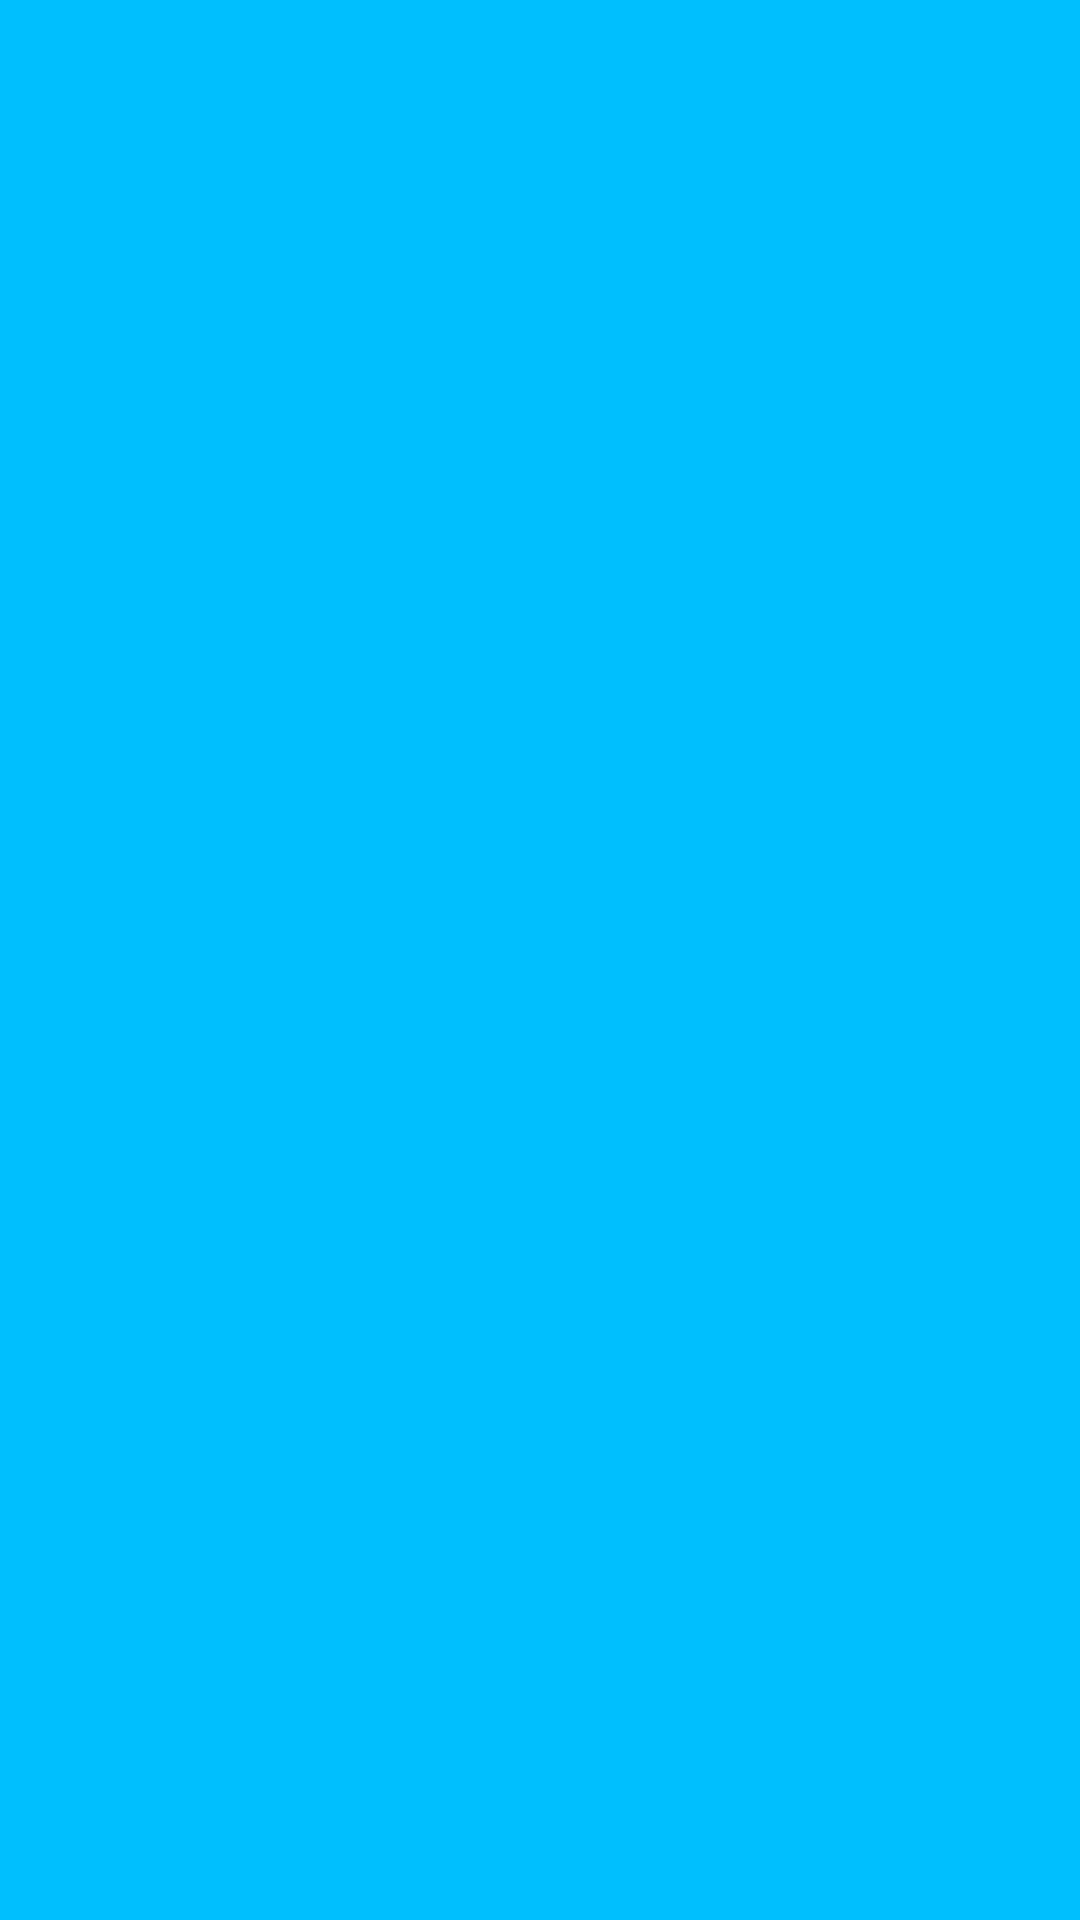 1080x1920 Capri Solid Color Background